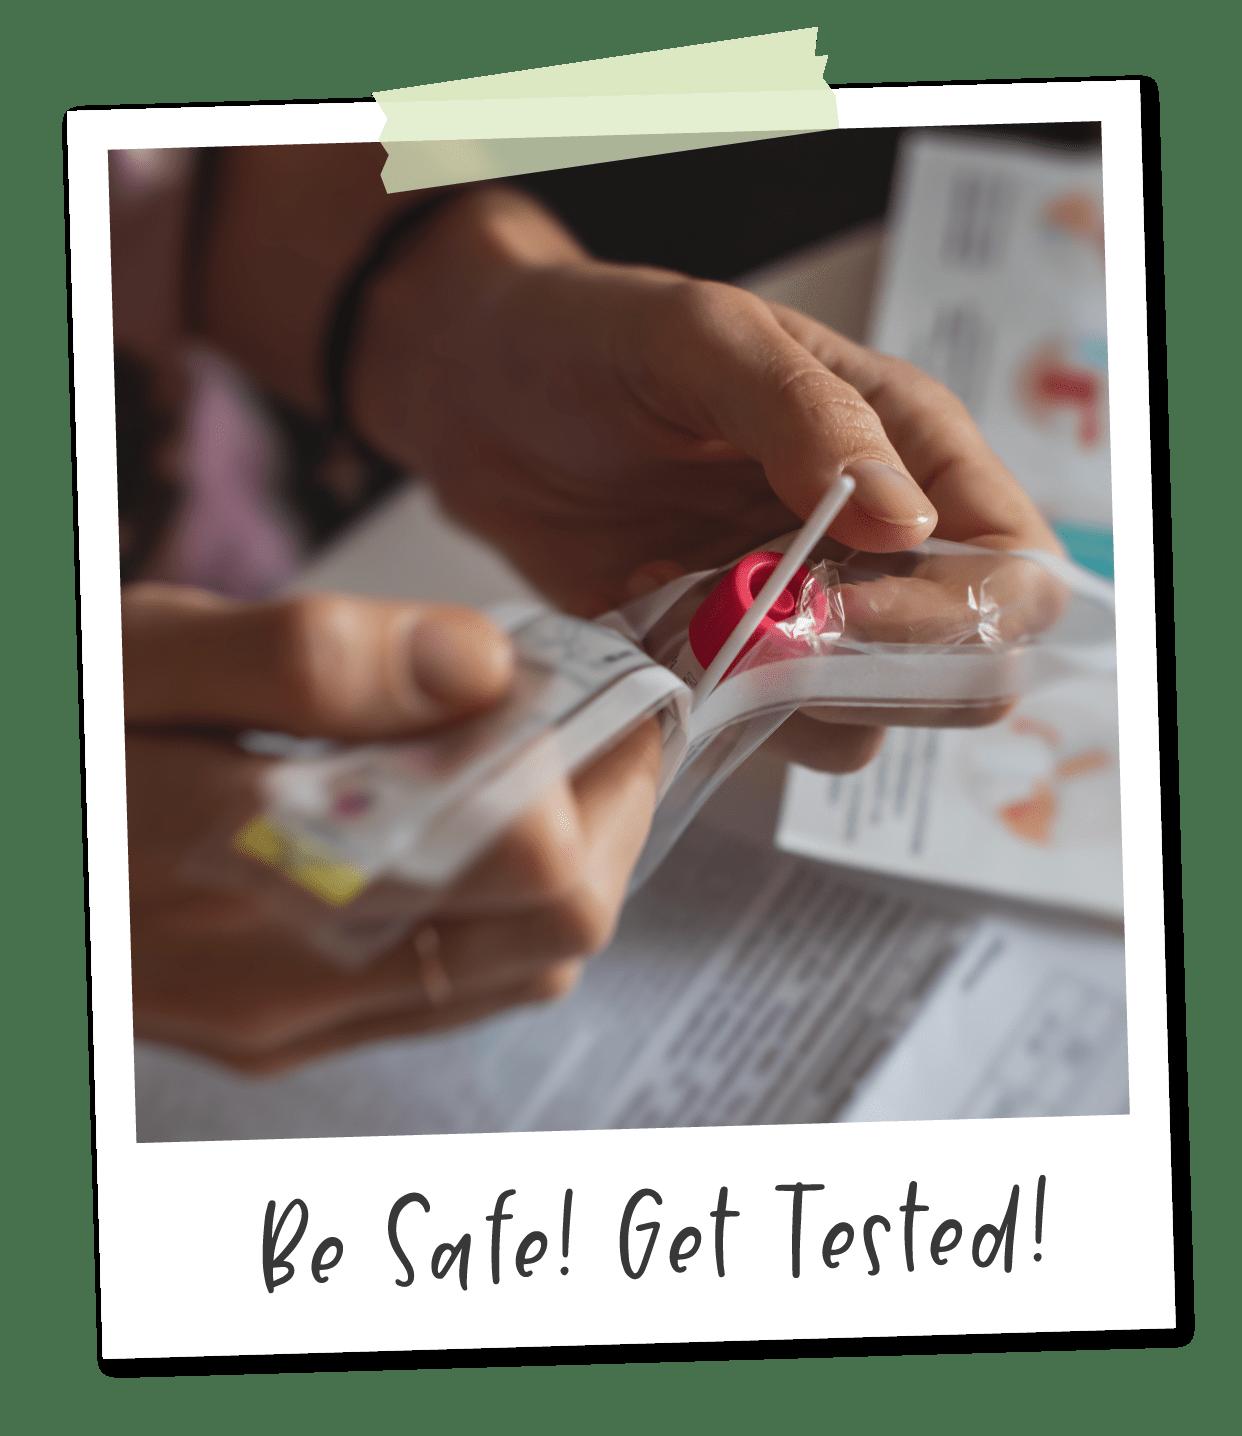 Alcove Health Free STI/STD Testing